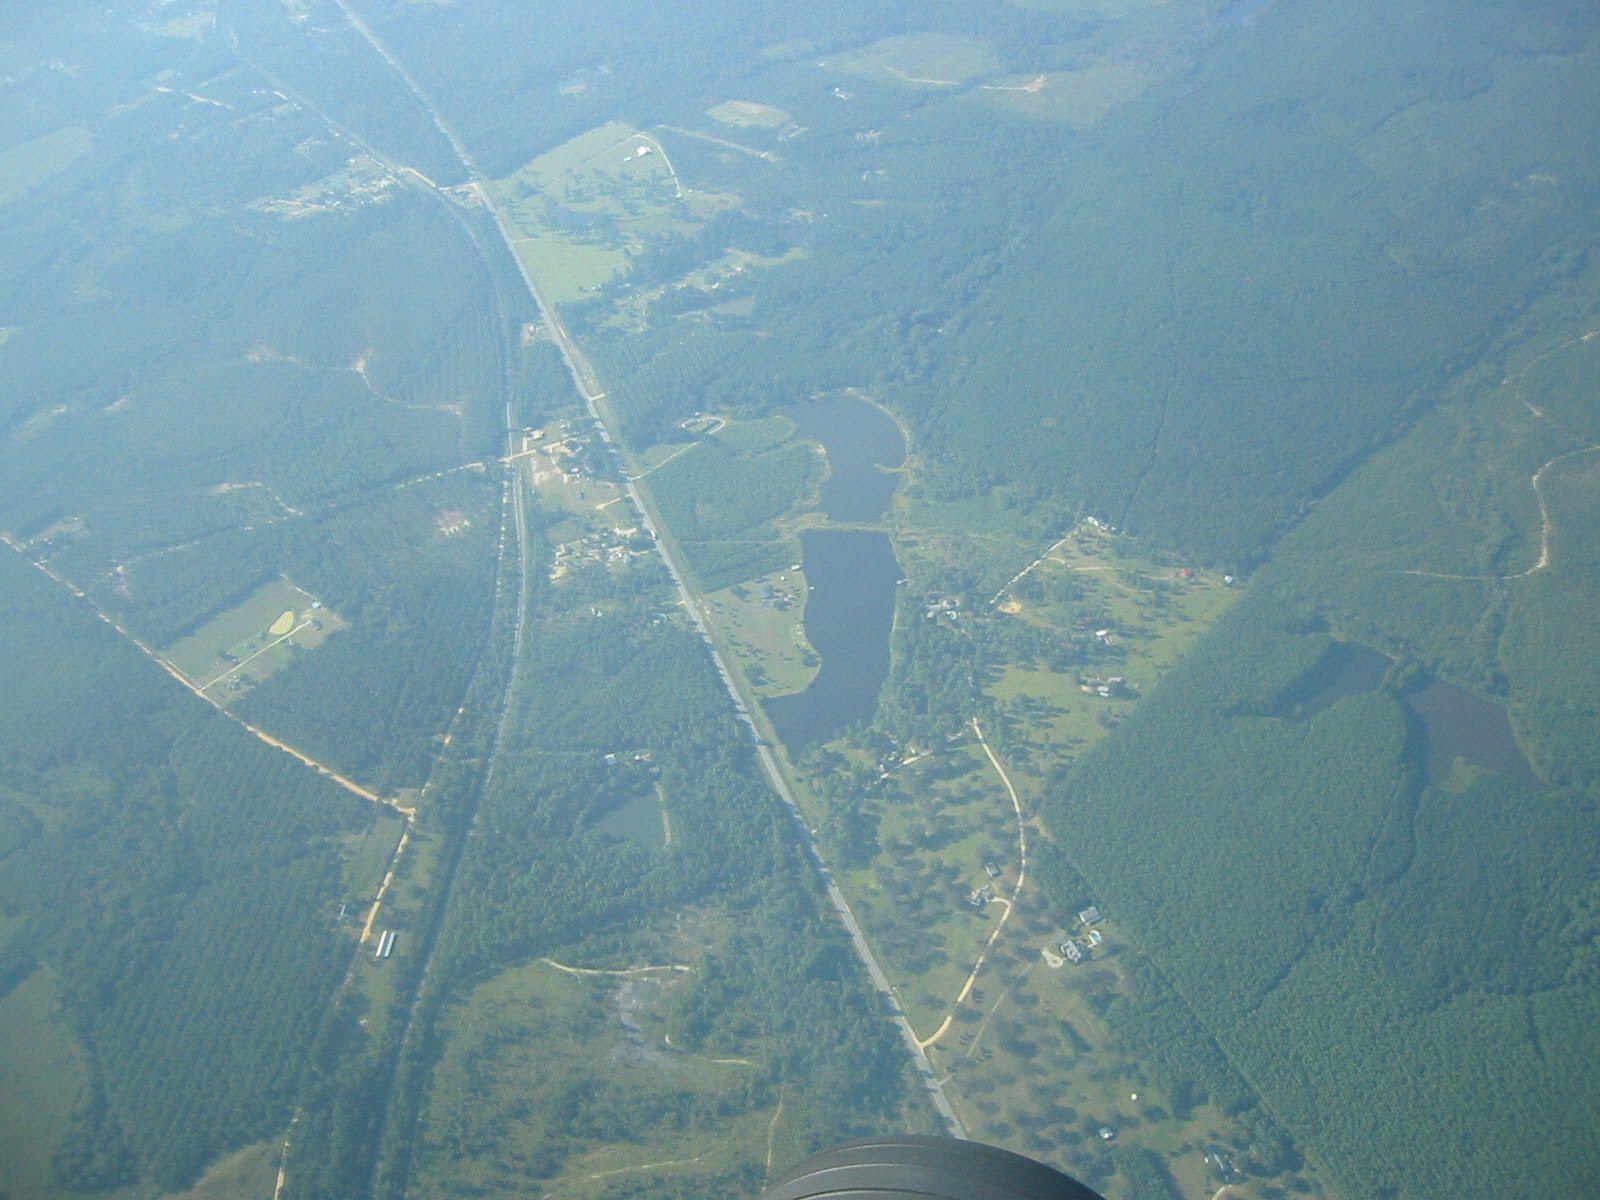 S.R. 129 Hawkinsville Georgia 4500 feet